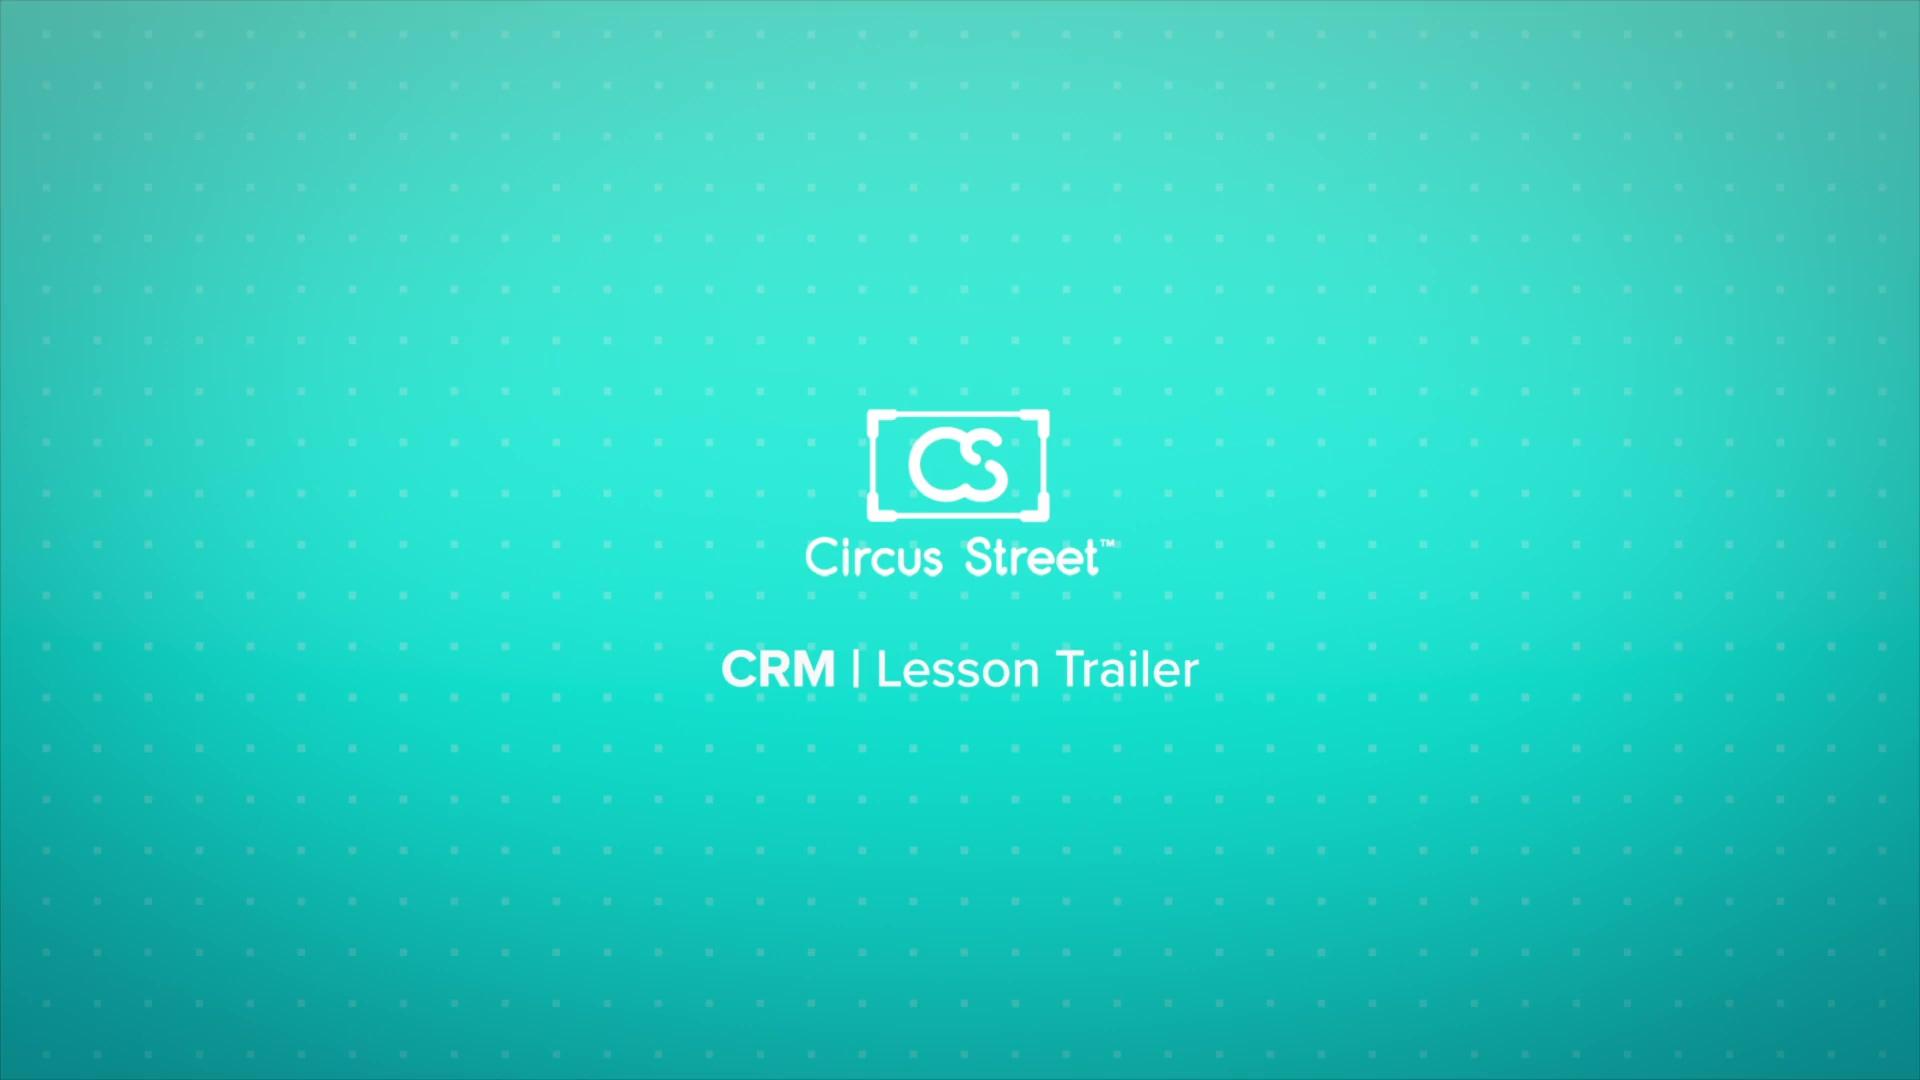 CRM Trailer